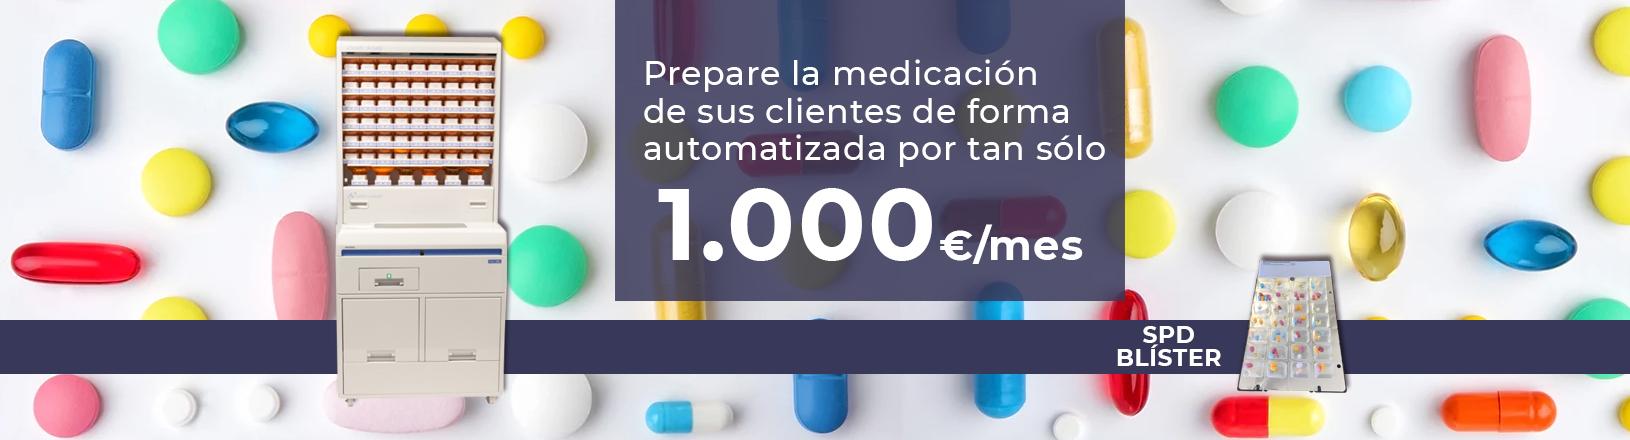 Máquina SPD automatizada de blisters para farmacia